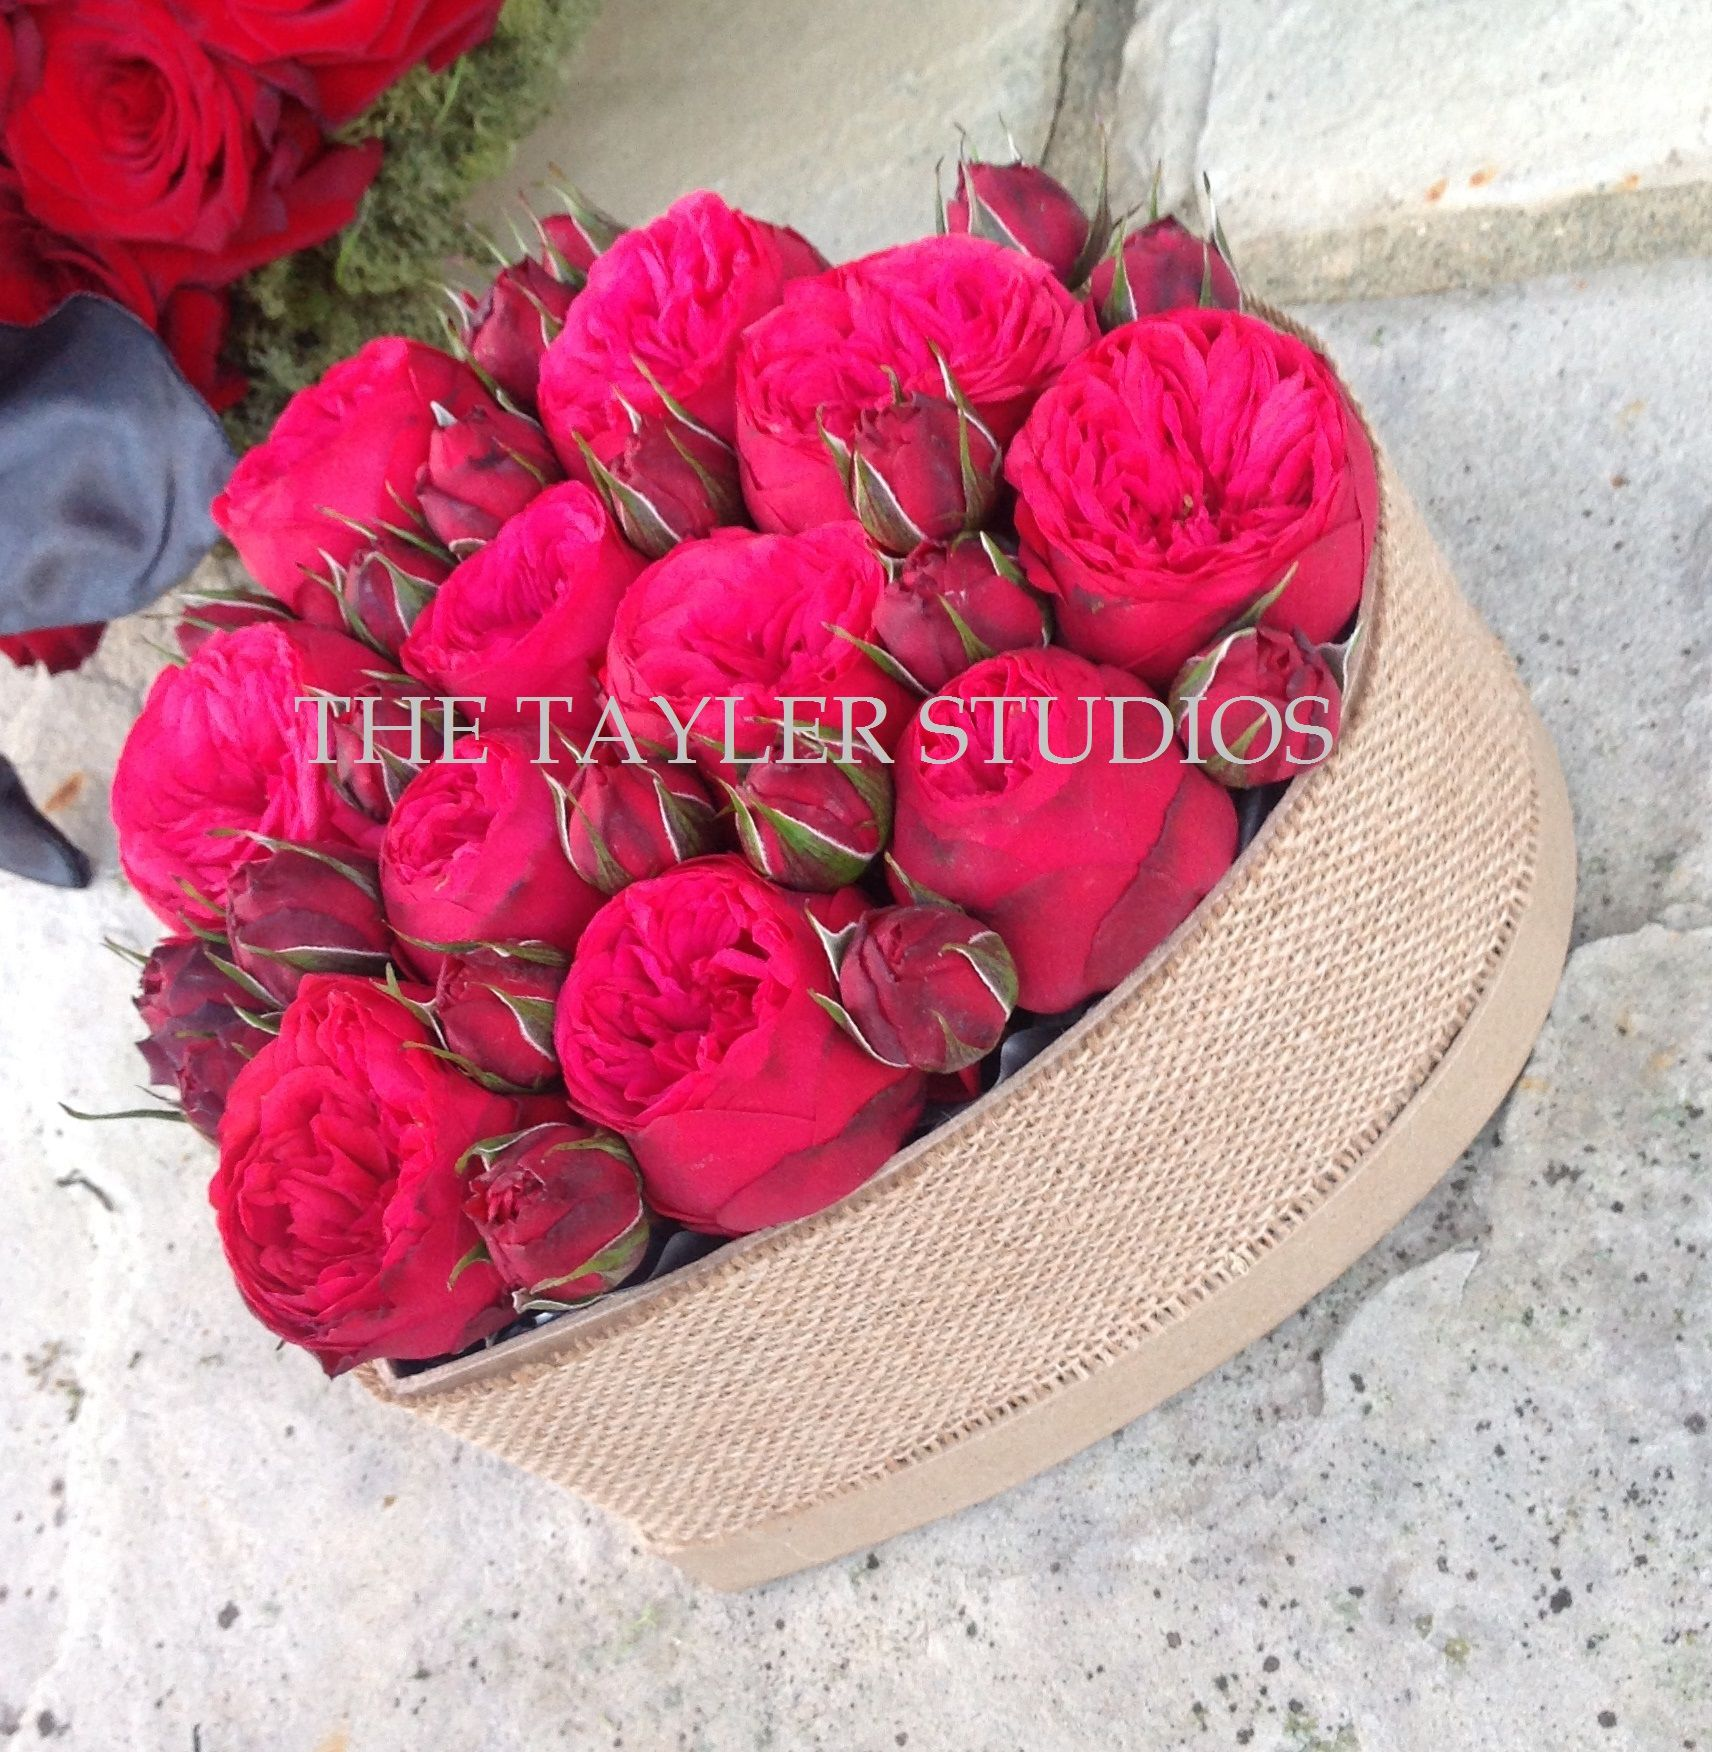 Exquisite Peony Rose display in keepsake Heart Box £67.50